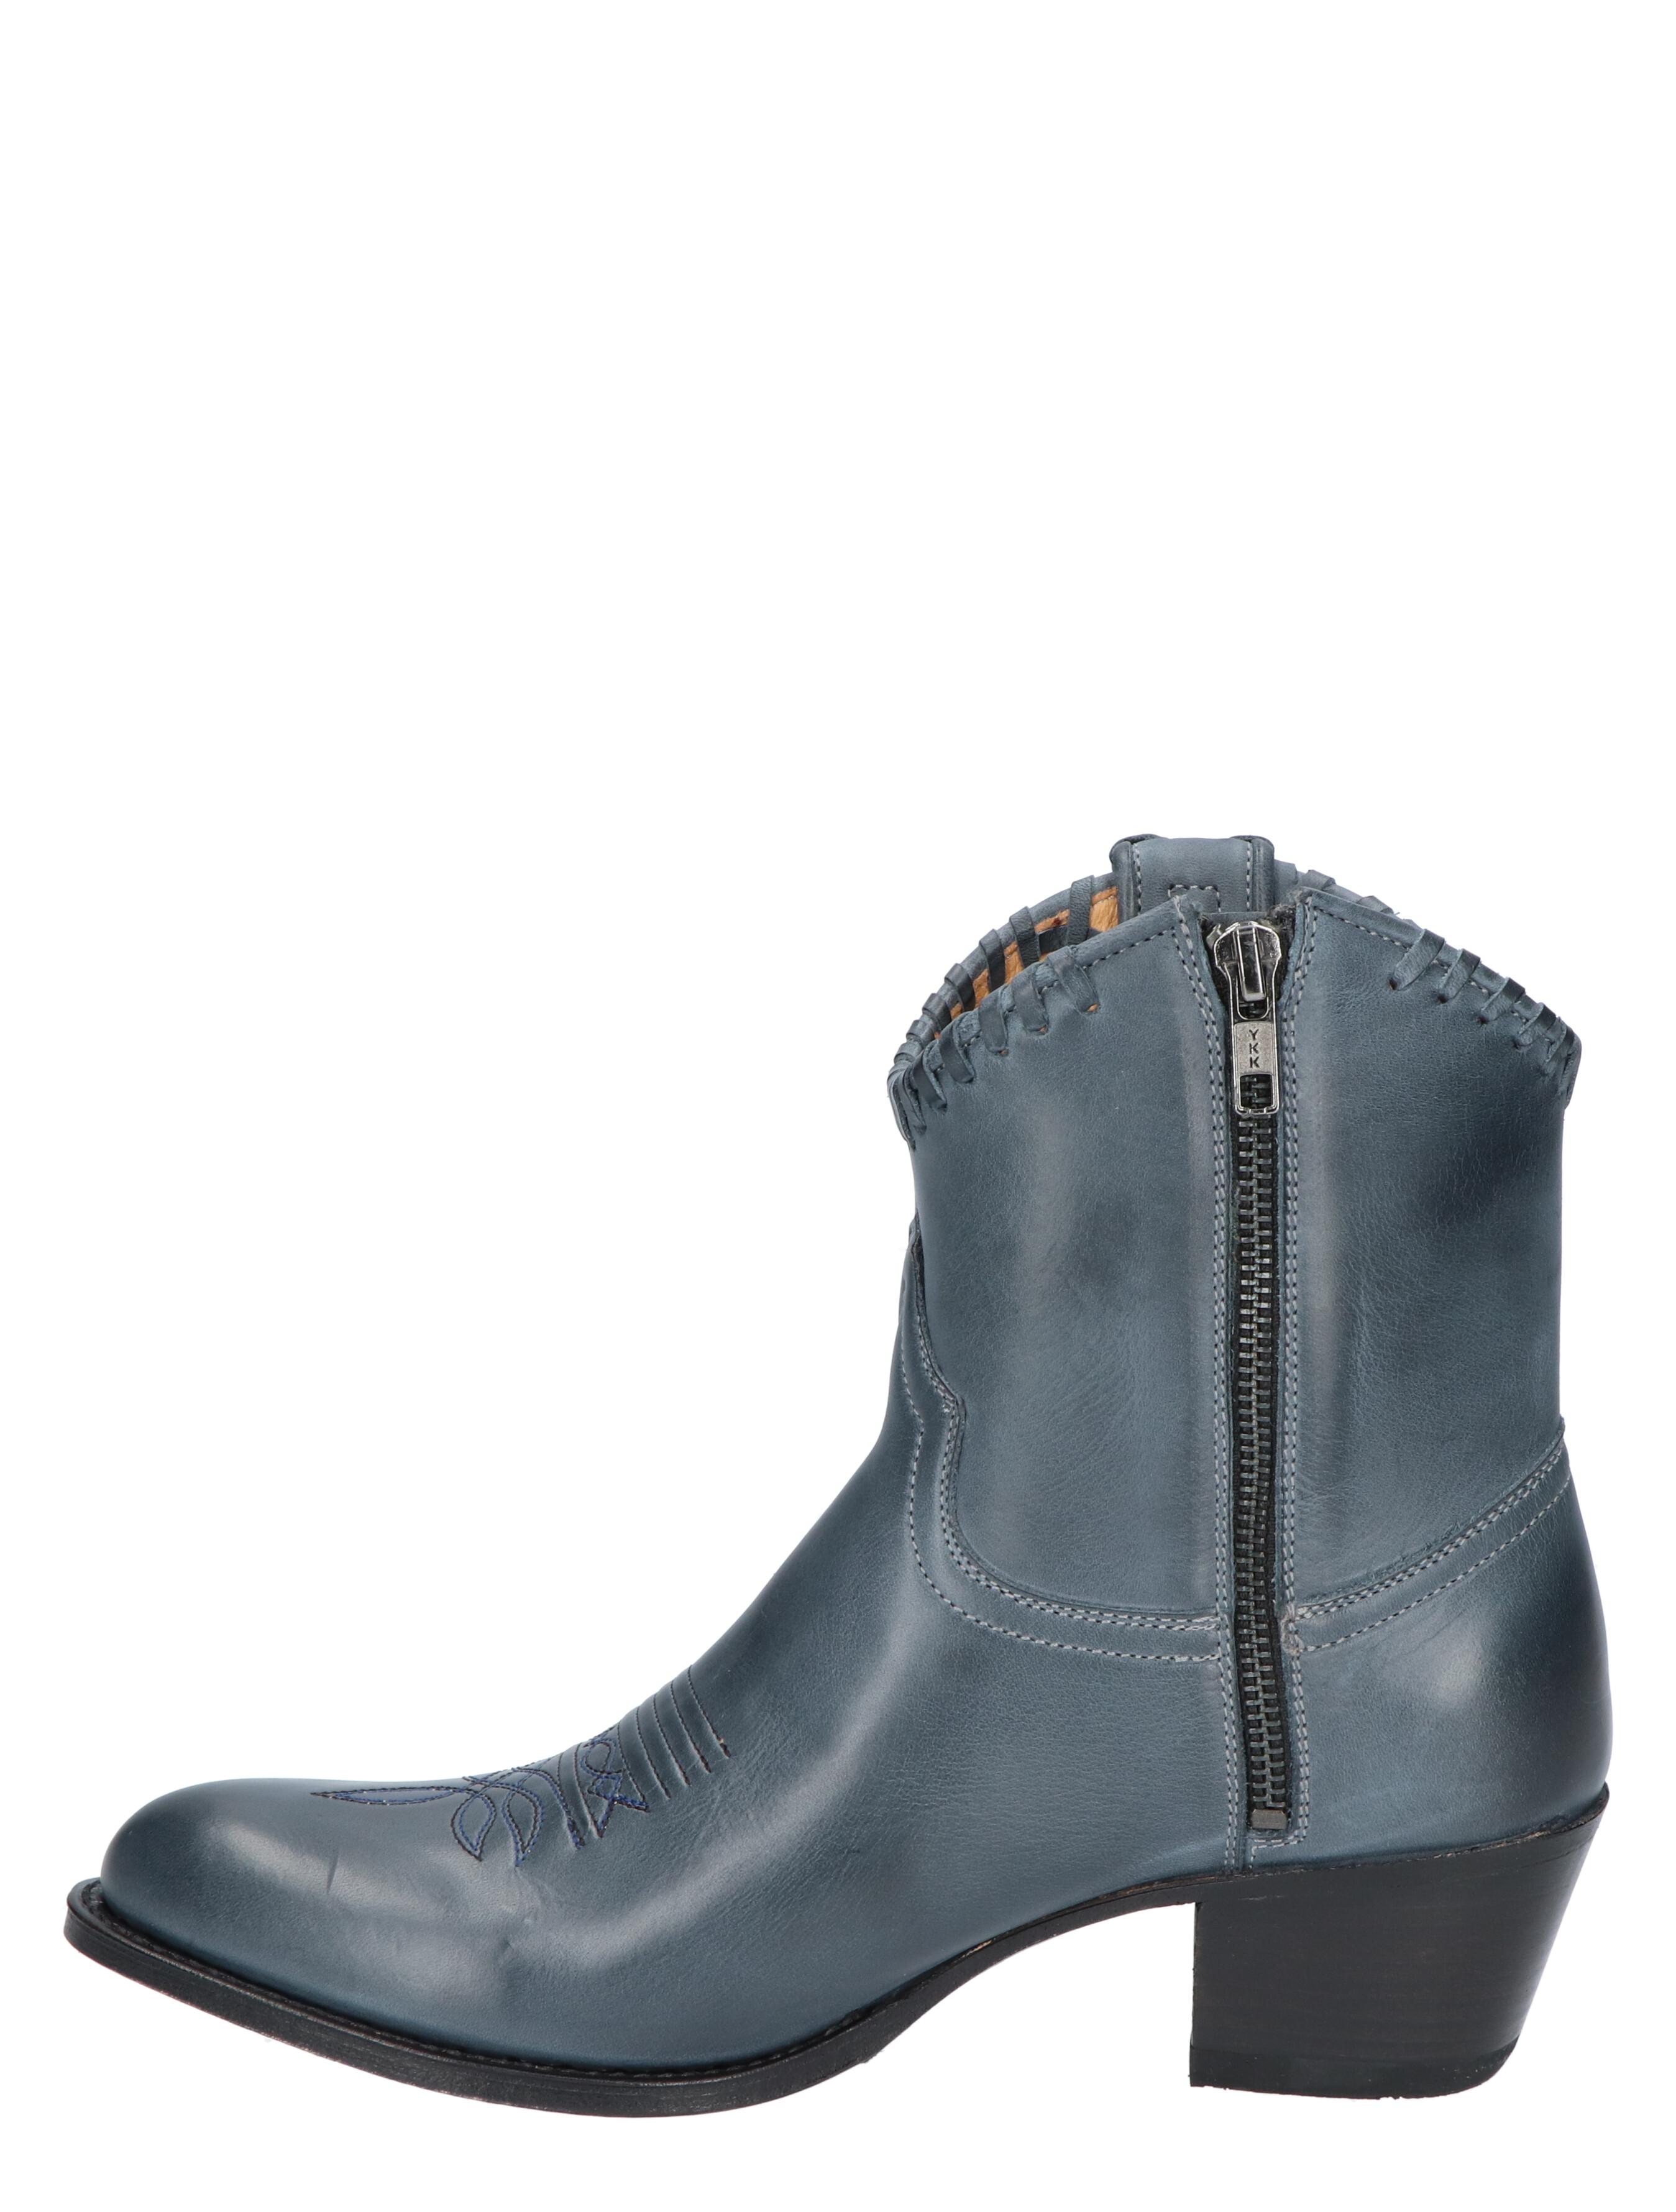 Sendra 14860 Debora Nl Flex Flota Egeo Bras Western boots